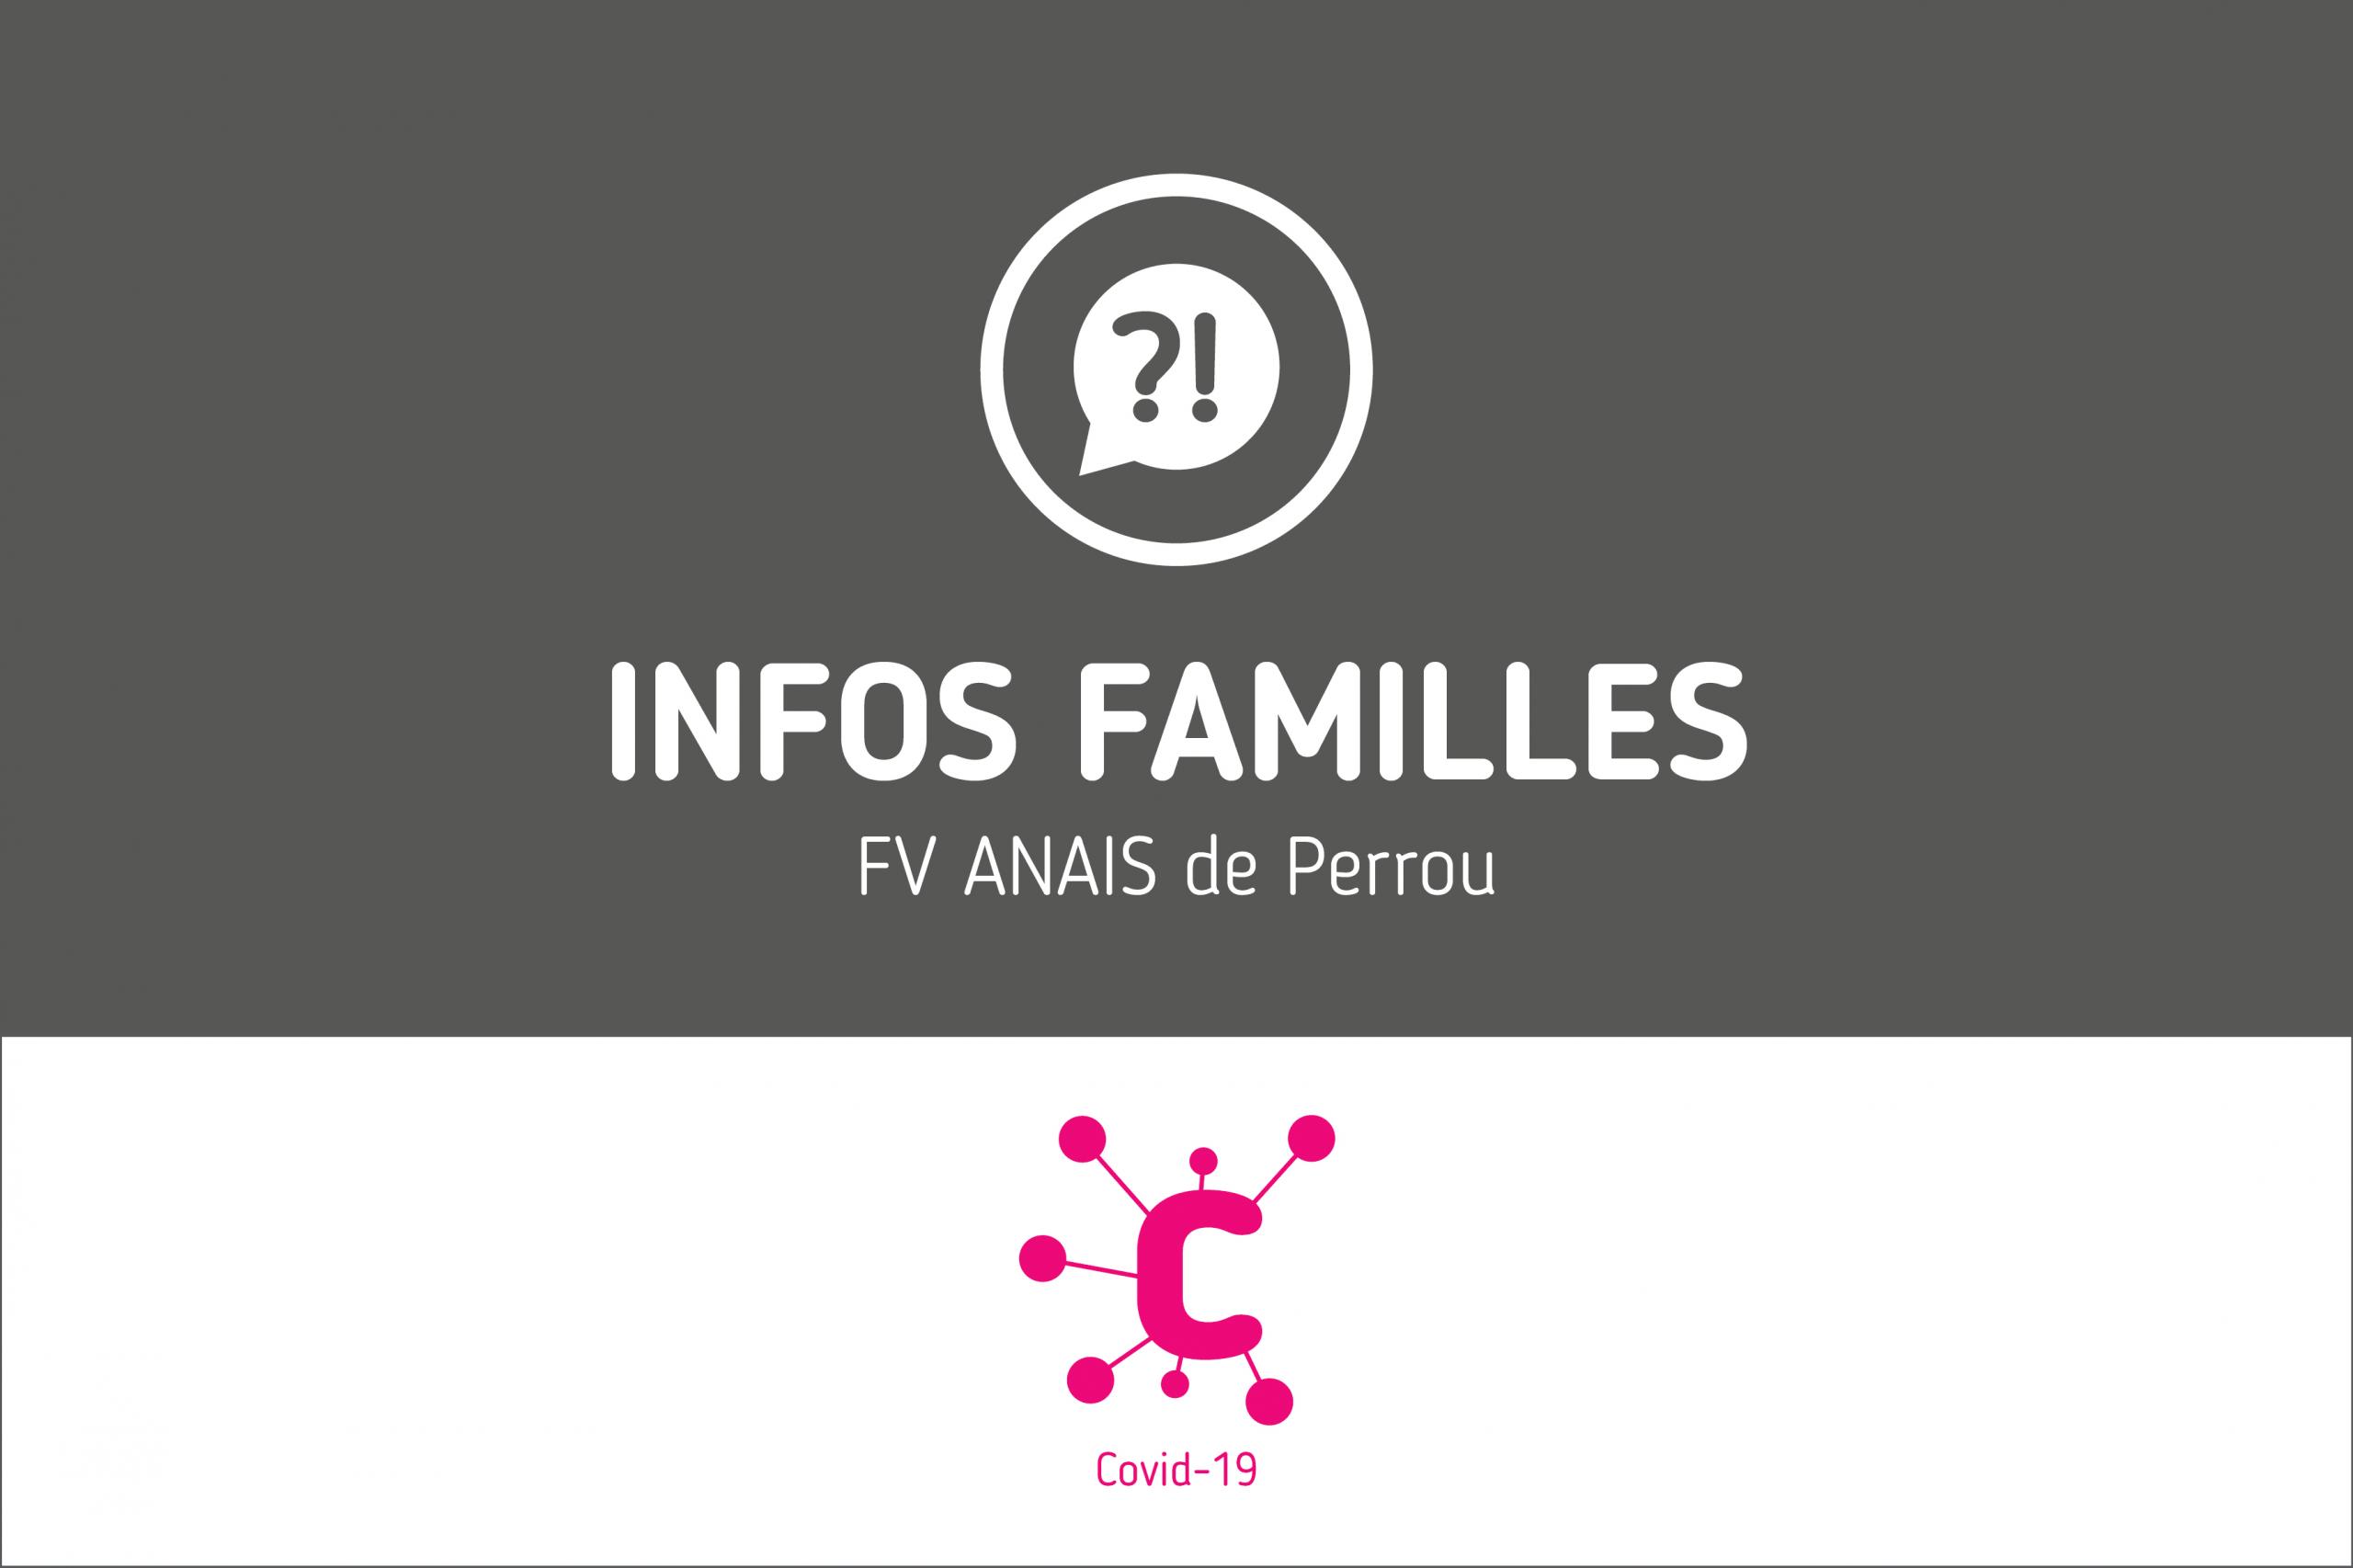 Protégé: Infos Familles – FV ANAIS de Perrou